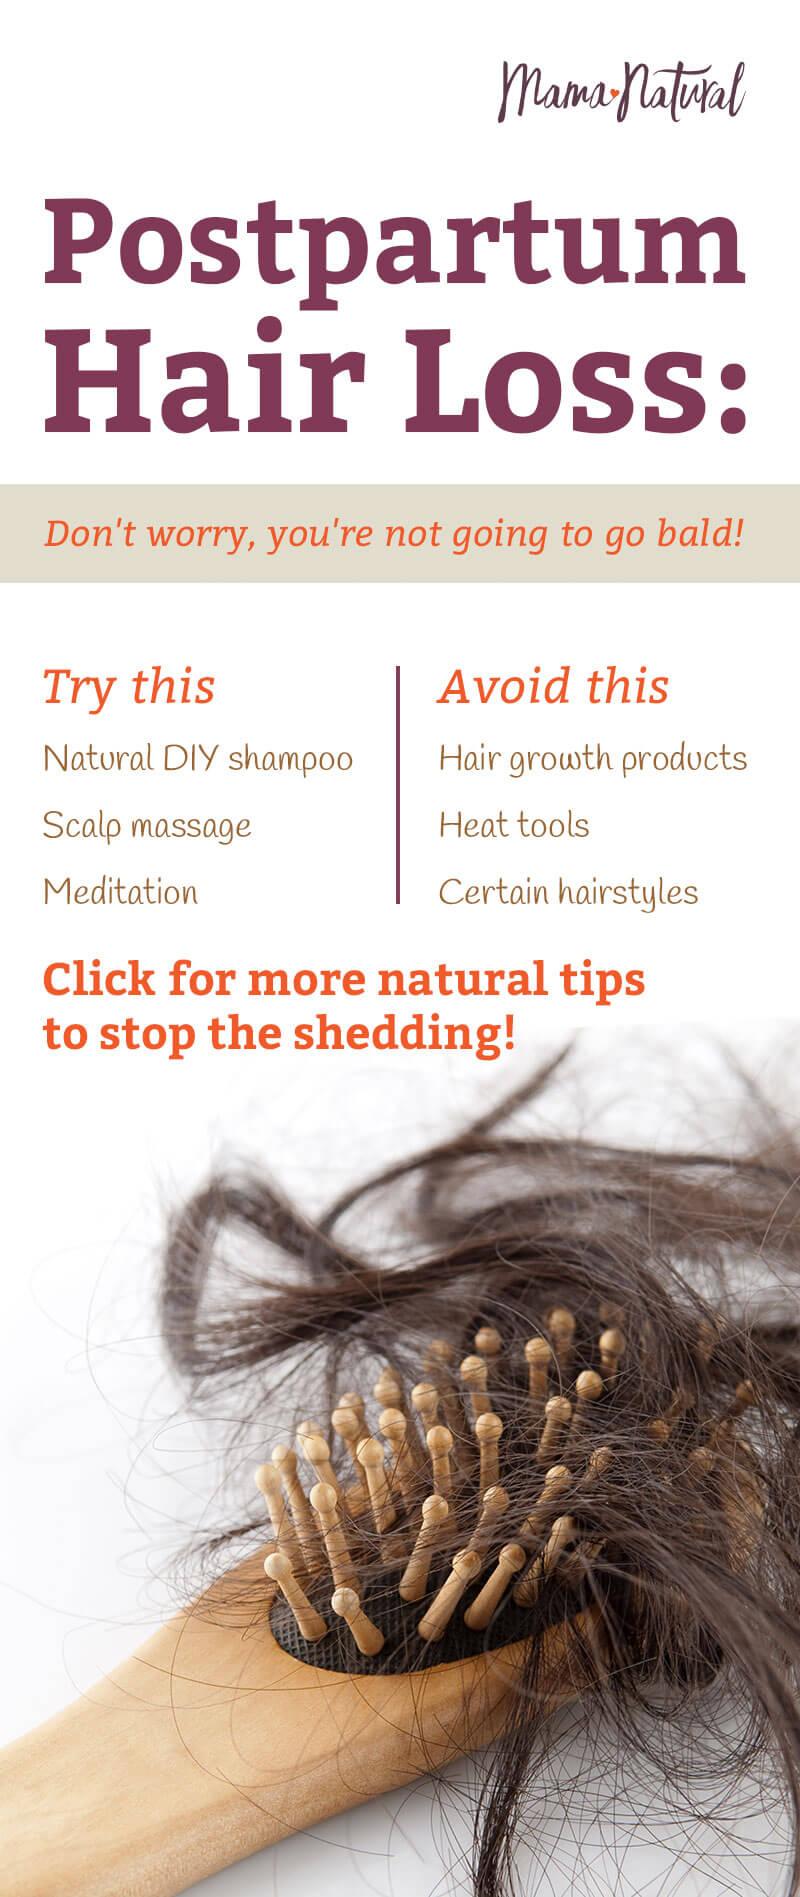 Postpartum Hair Loss: Natural Treatments & Remedies